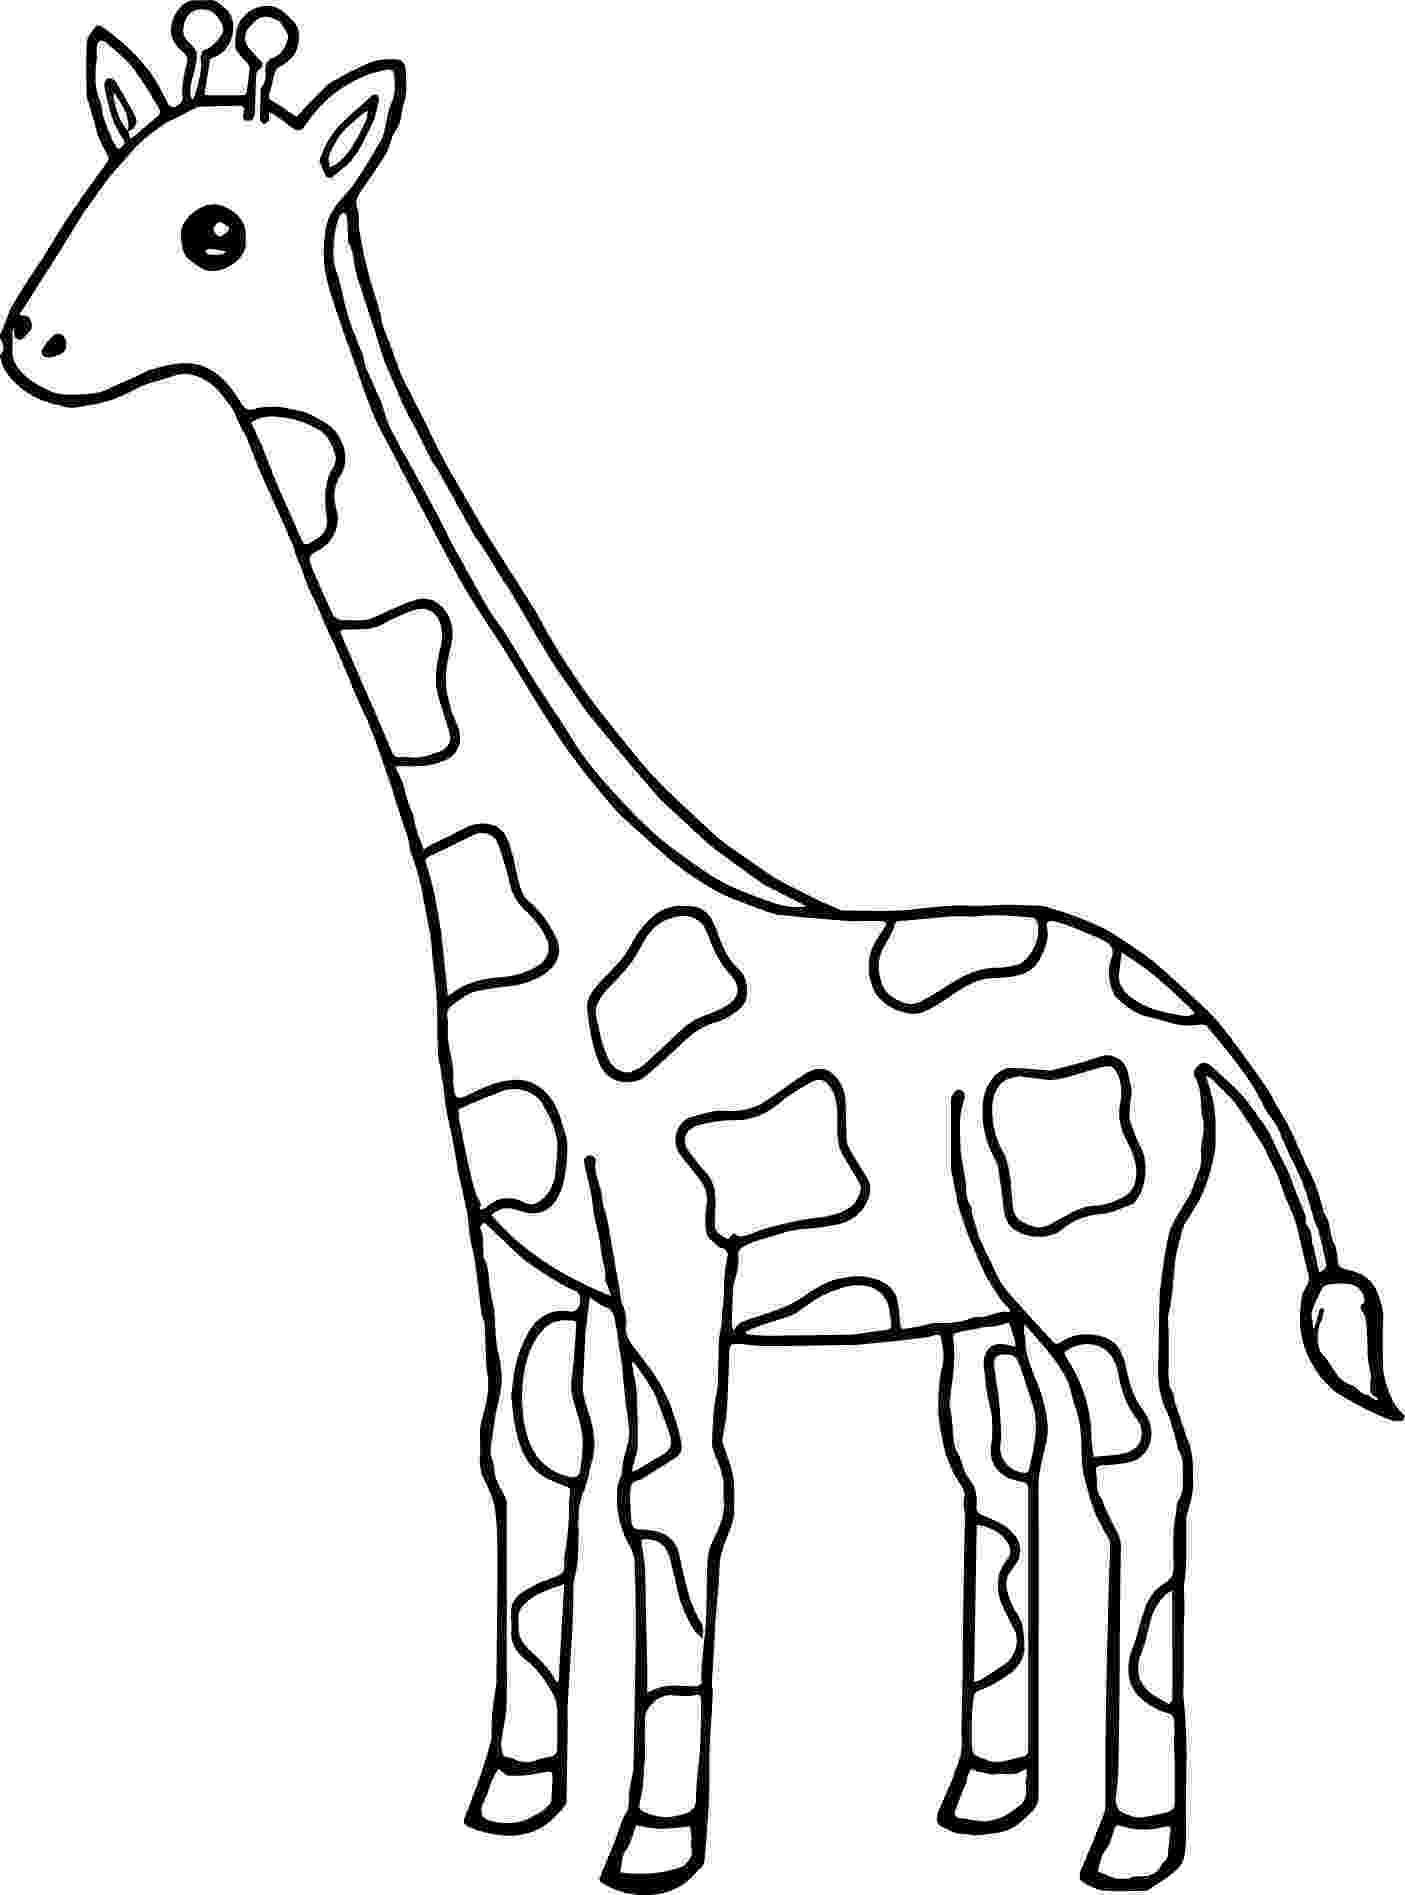 giraffe colouring picture tall giraffe coloring page wecoloringpagecom picture giraffe colouring